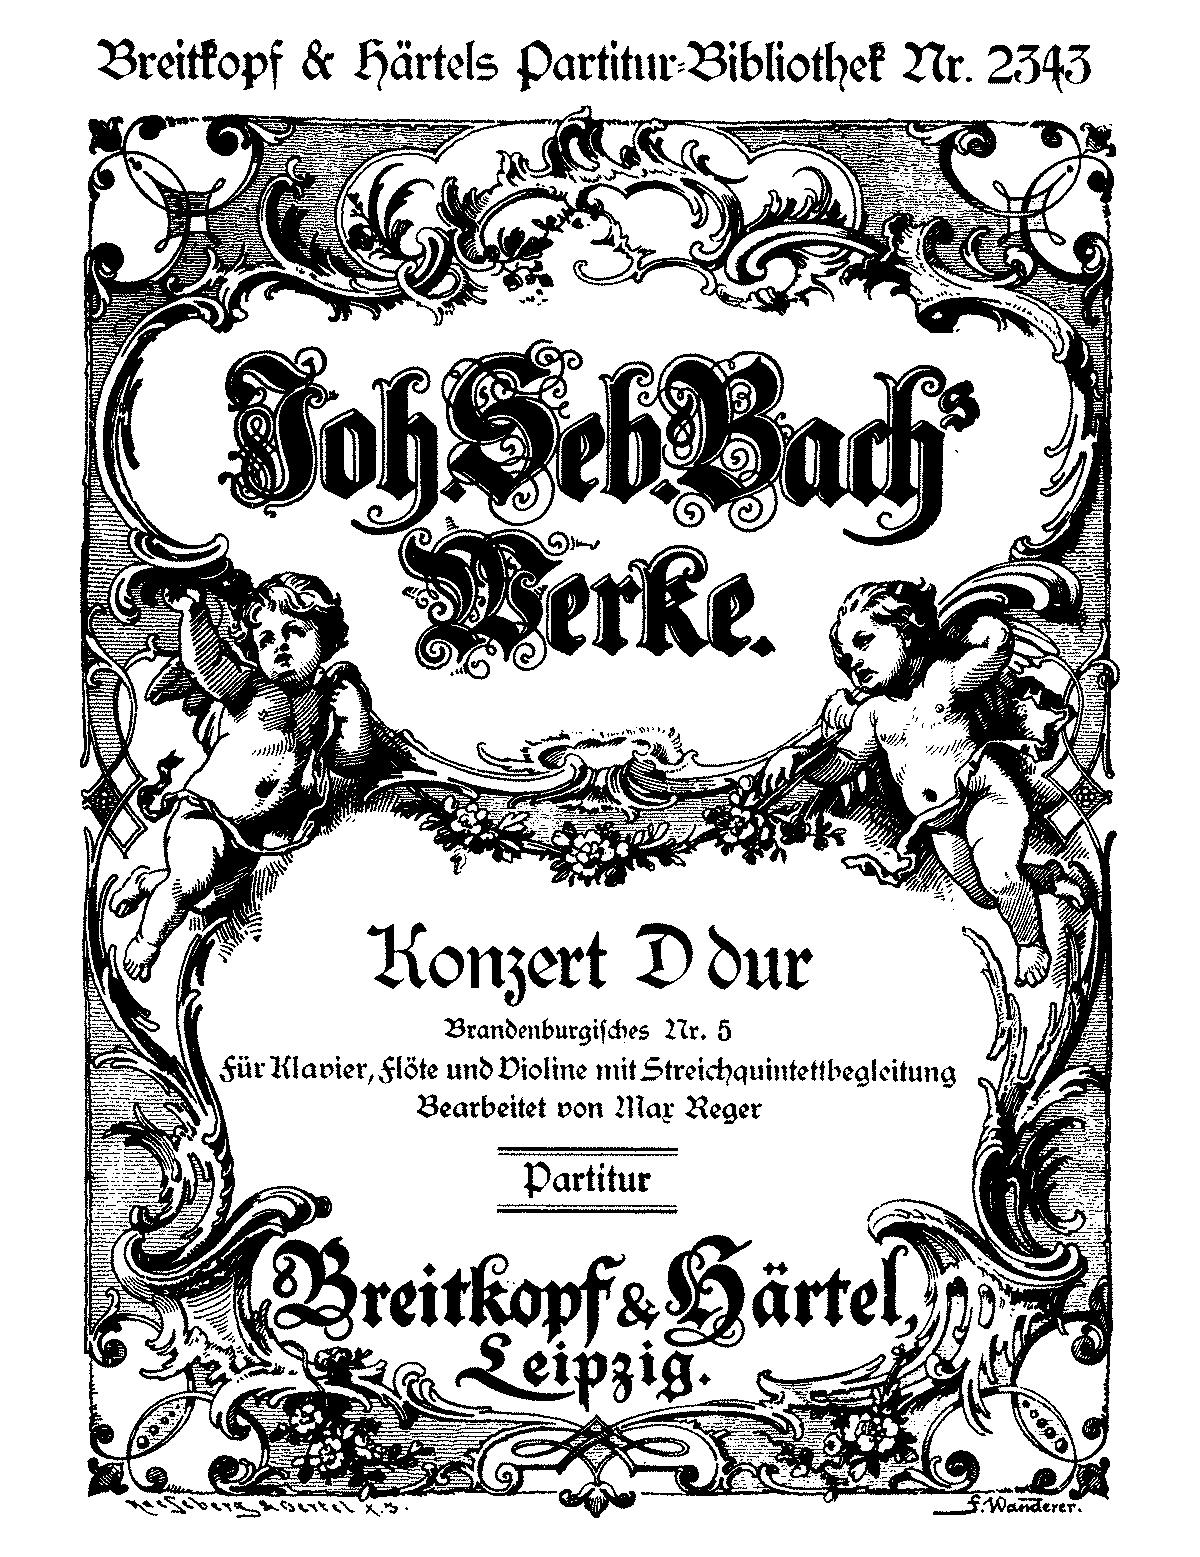 brandenburg concerto no. 5 in d major analysis Johann sebastian bach - brandenburg concerto no 5 in d major 3320 eur - see more - buy online pre-shipment lead time: on order format : sheet music + cd.